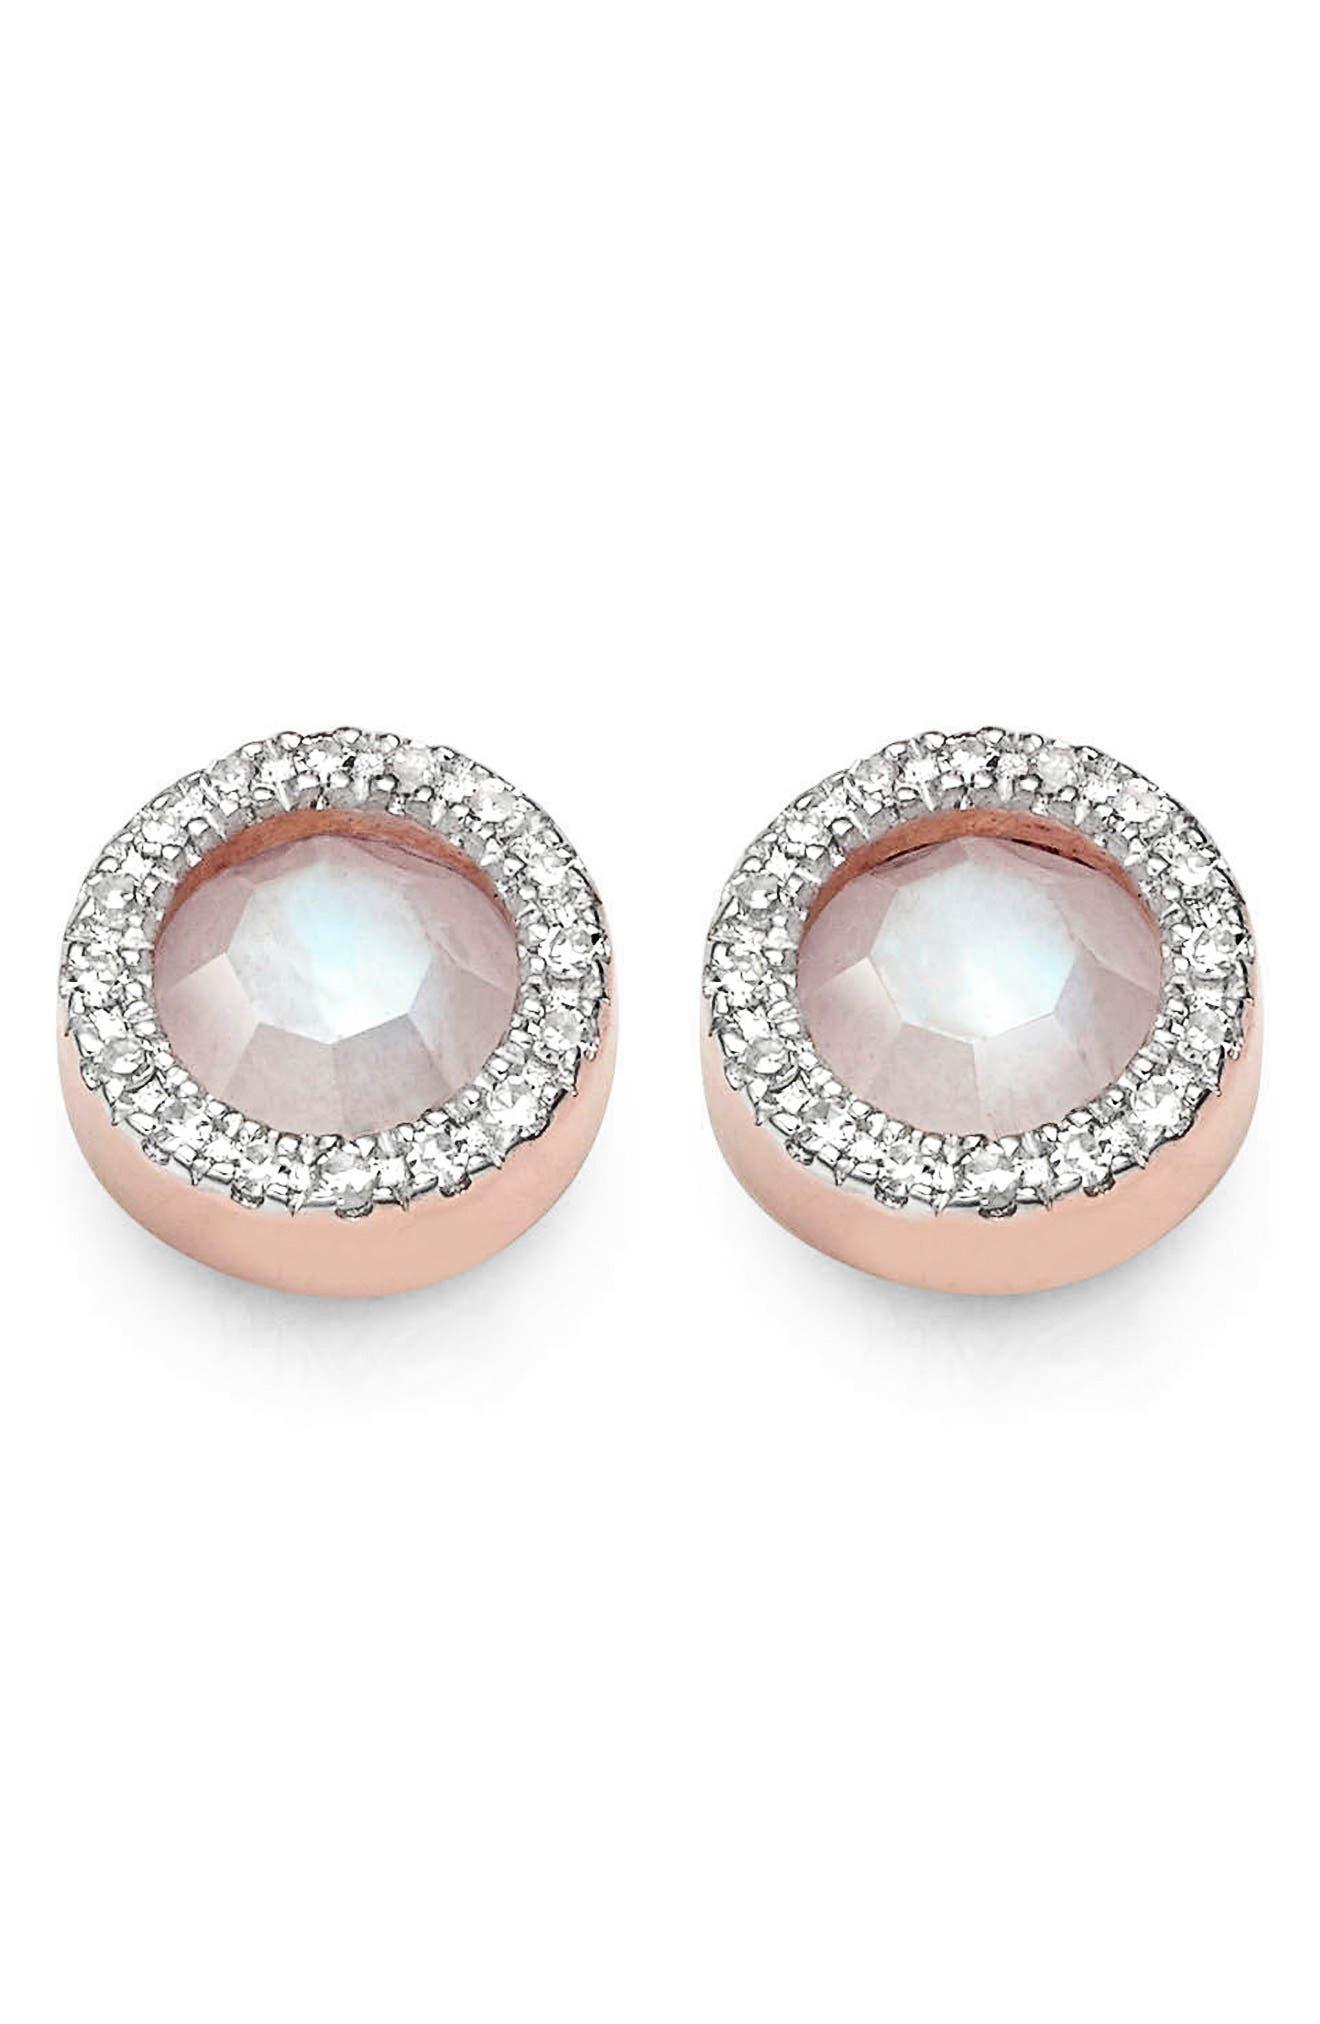 MONICA VINADER Naida Diamond & Semiprecious Stone Stud Earrings, Main, color, 665